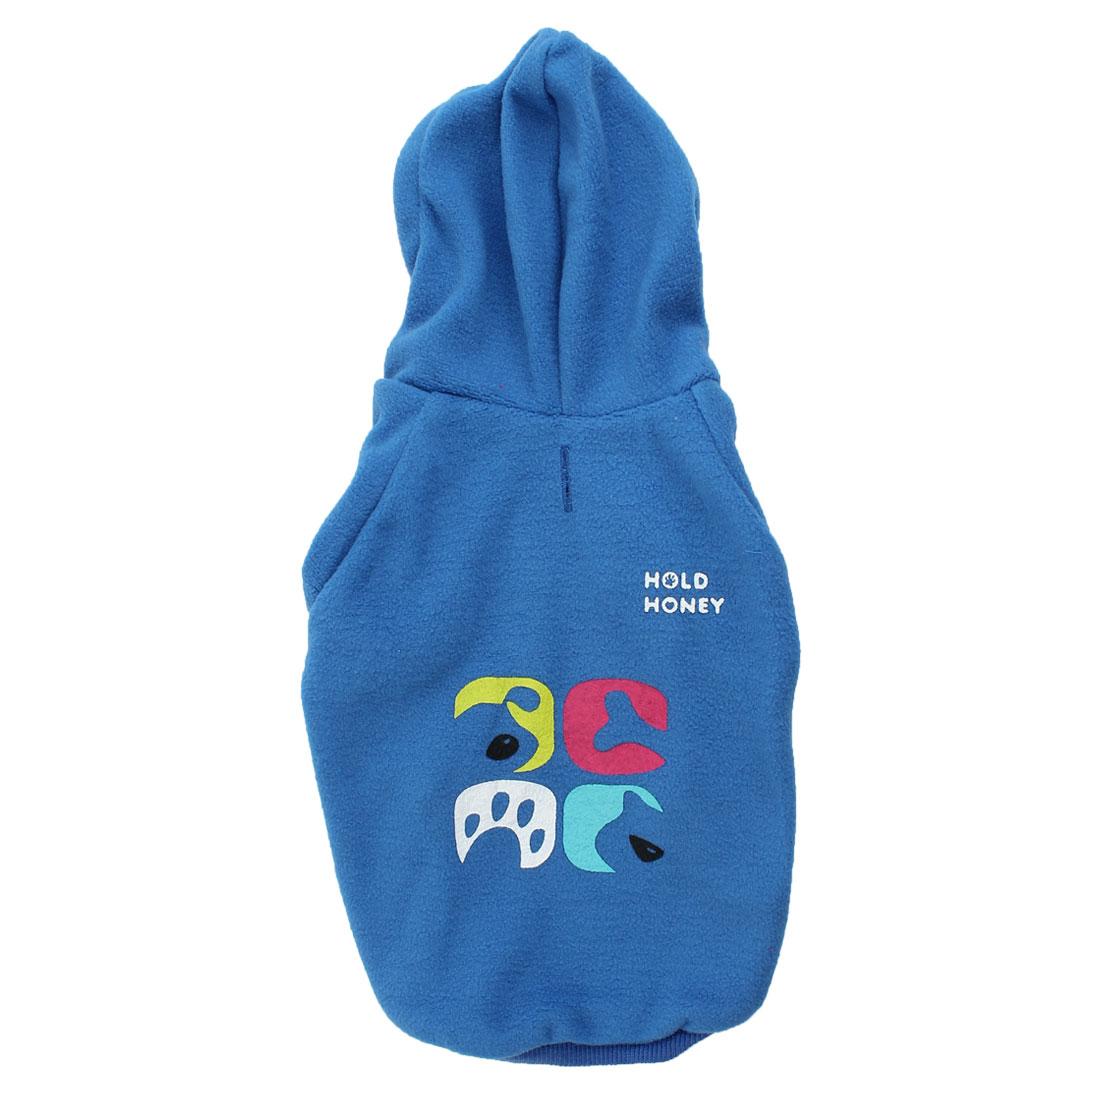 Winter Warm Fleece Raglan Sleeve Pet Dog Yorkie Coat Clothing Blue S